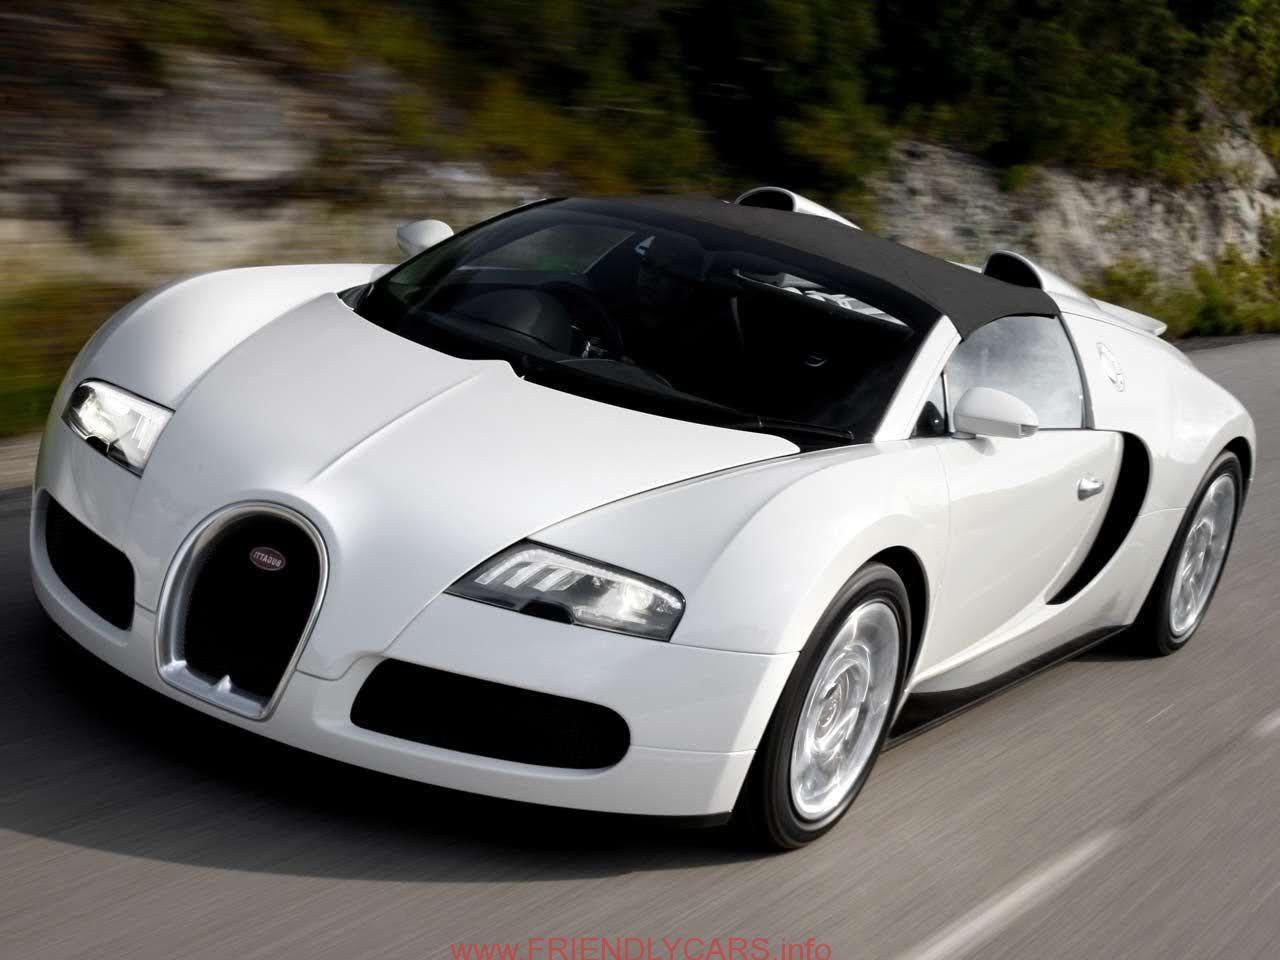 Bugatti Veyron Hypersport nice bugatti super sport white image hd 2014 bugatti veyron hyper